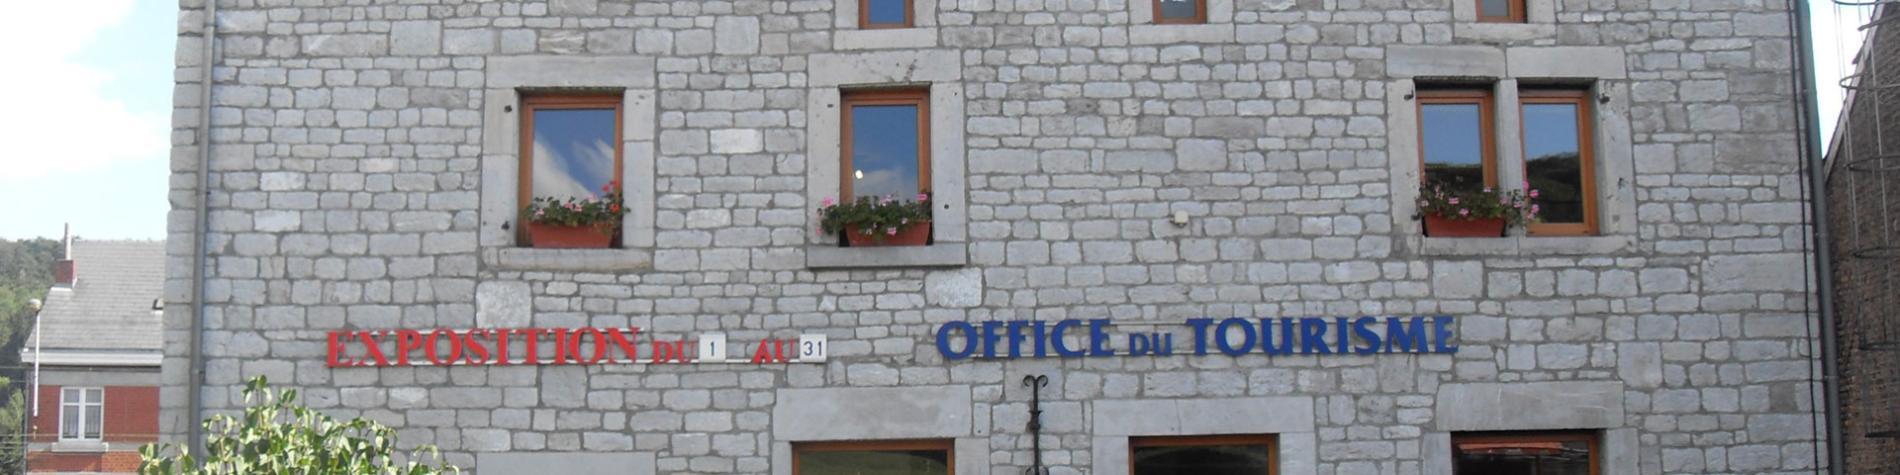 Office du Tourisme - Hamoir